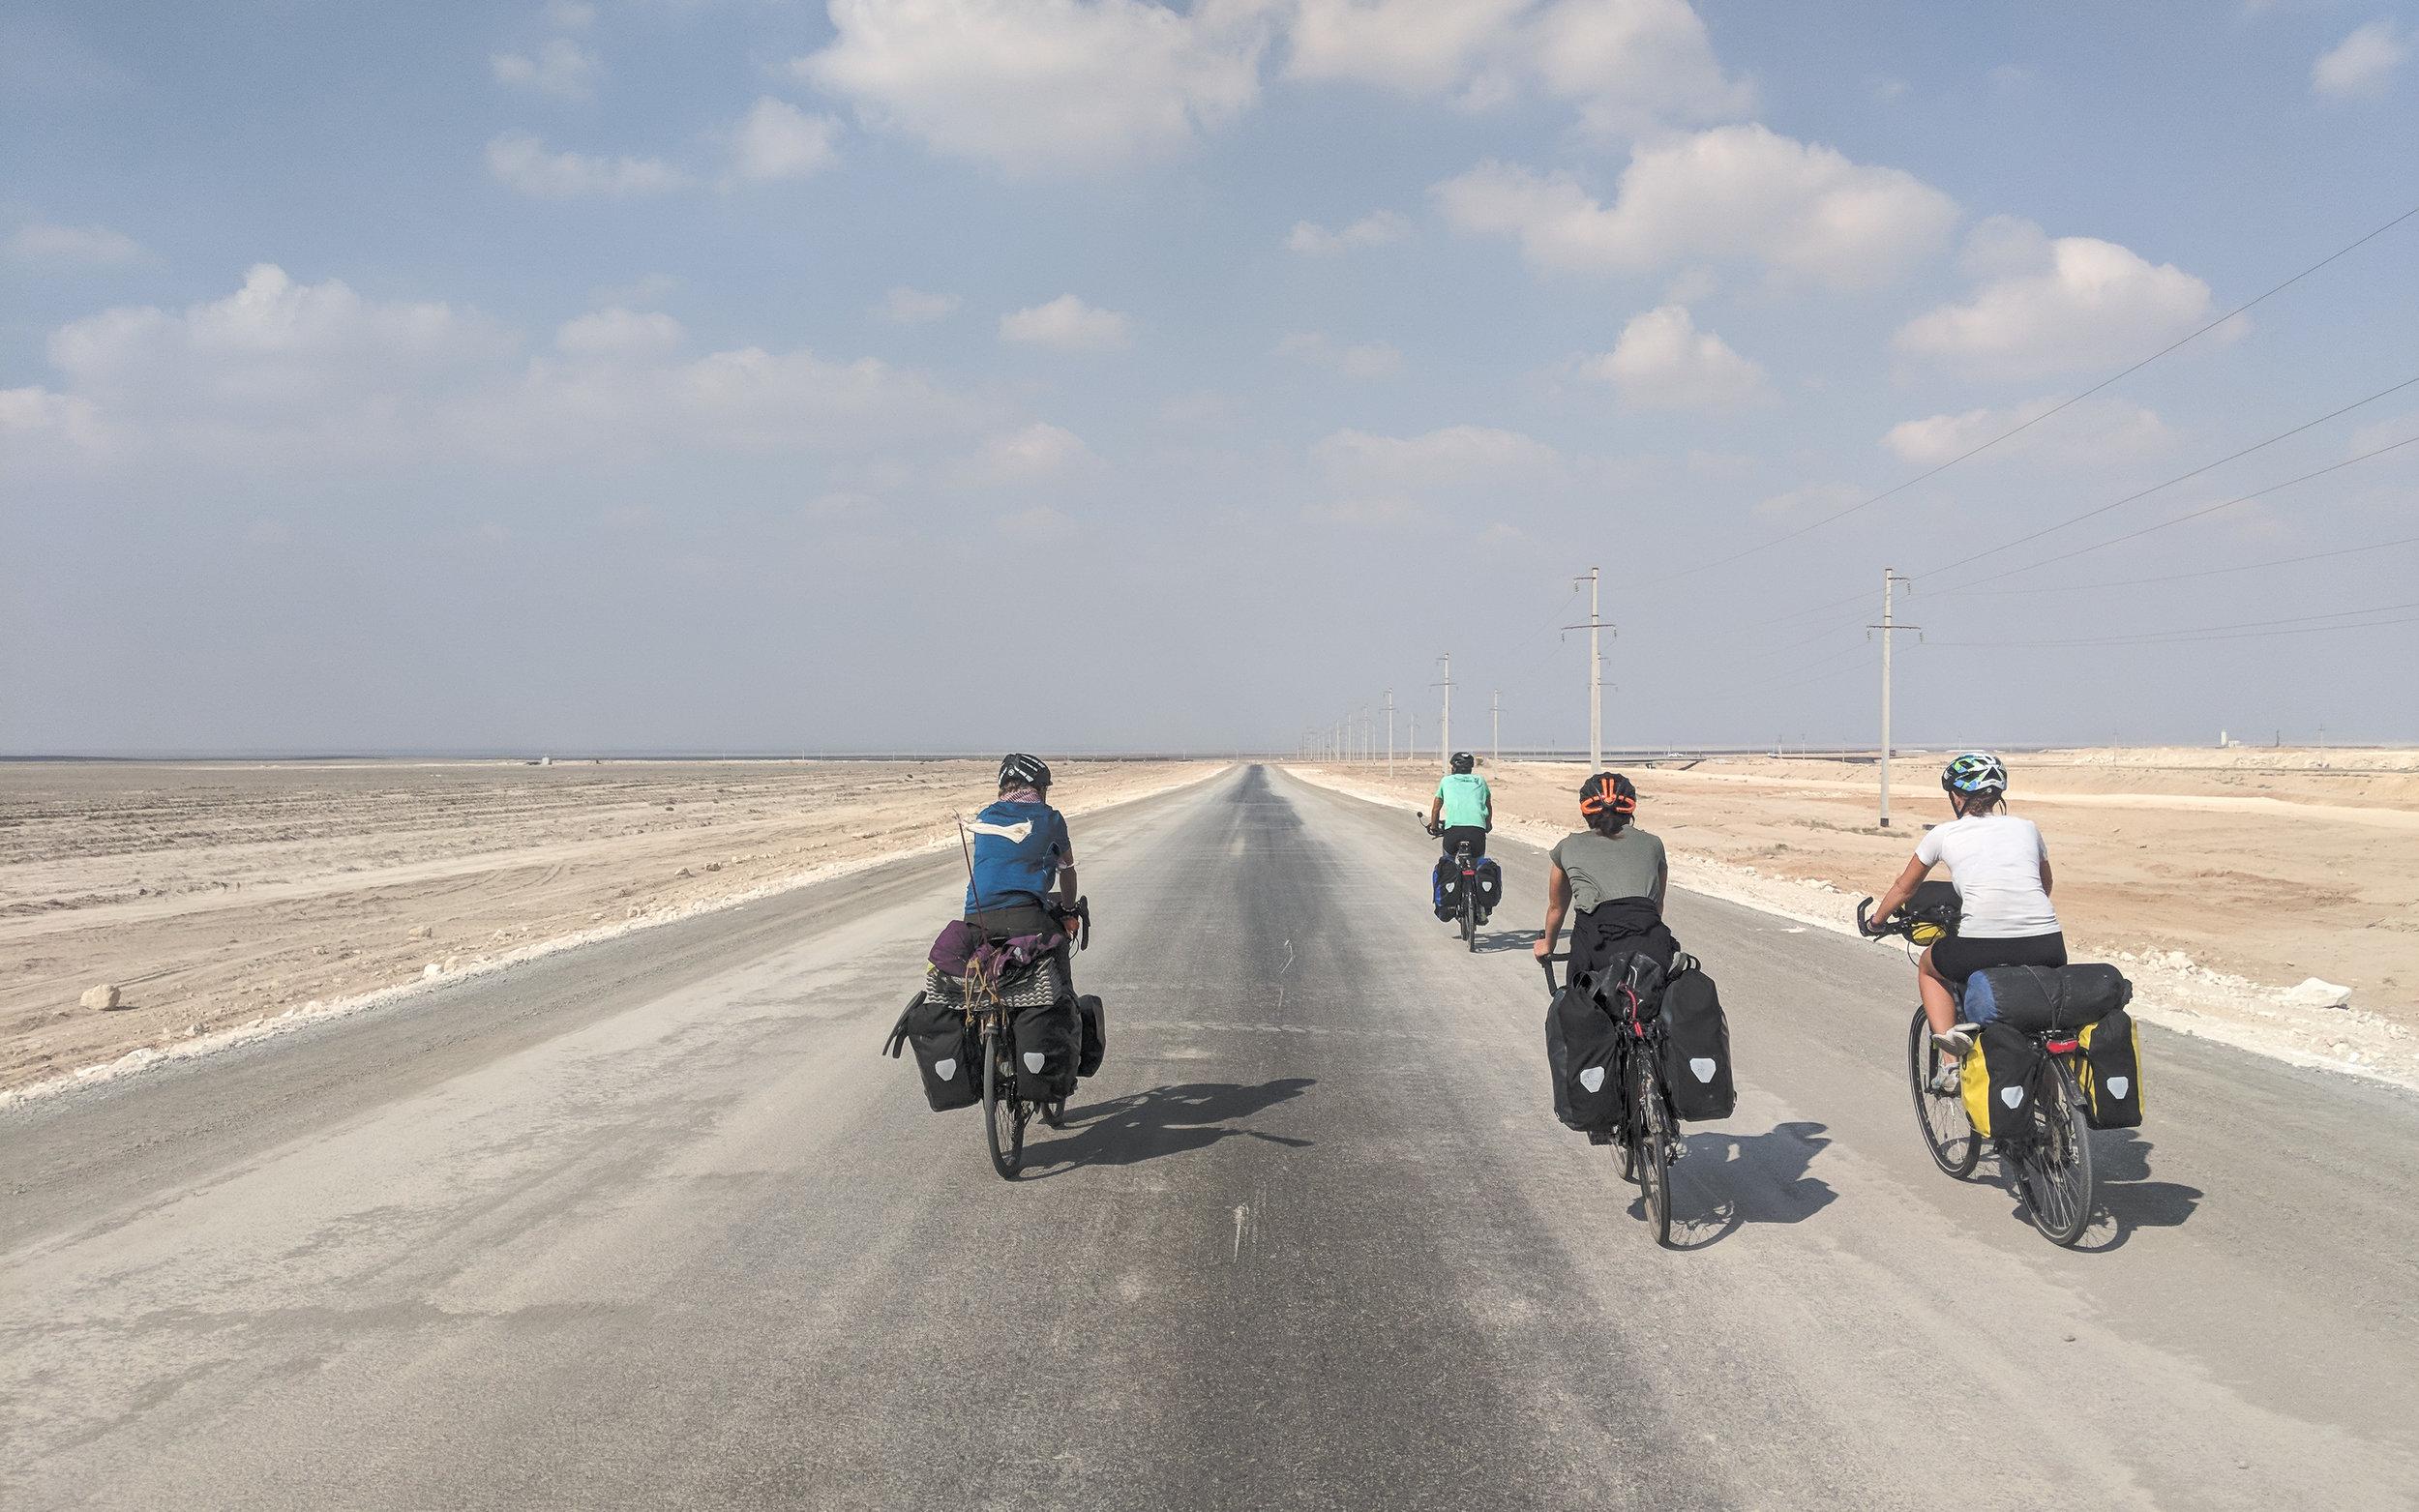 Riding off into the steppe, Kazakstan!